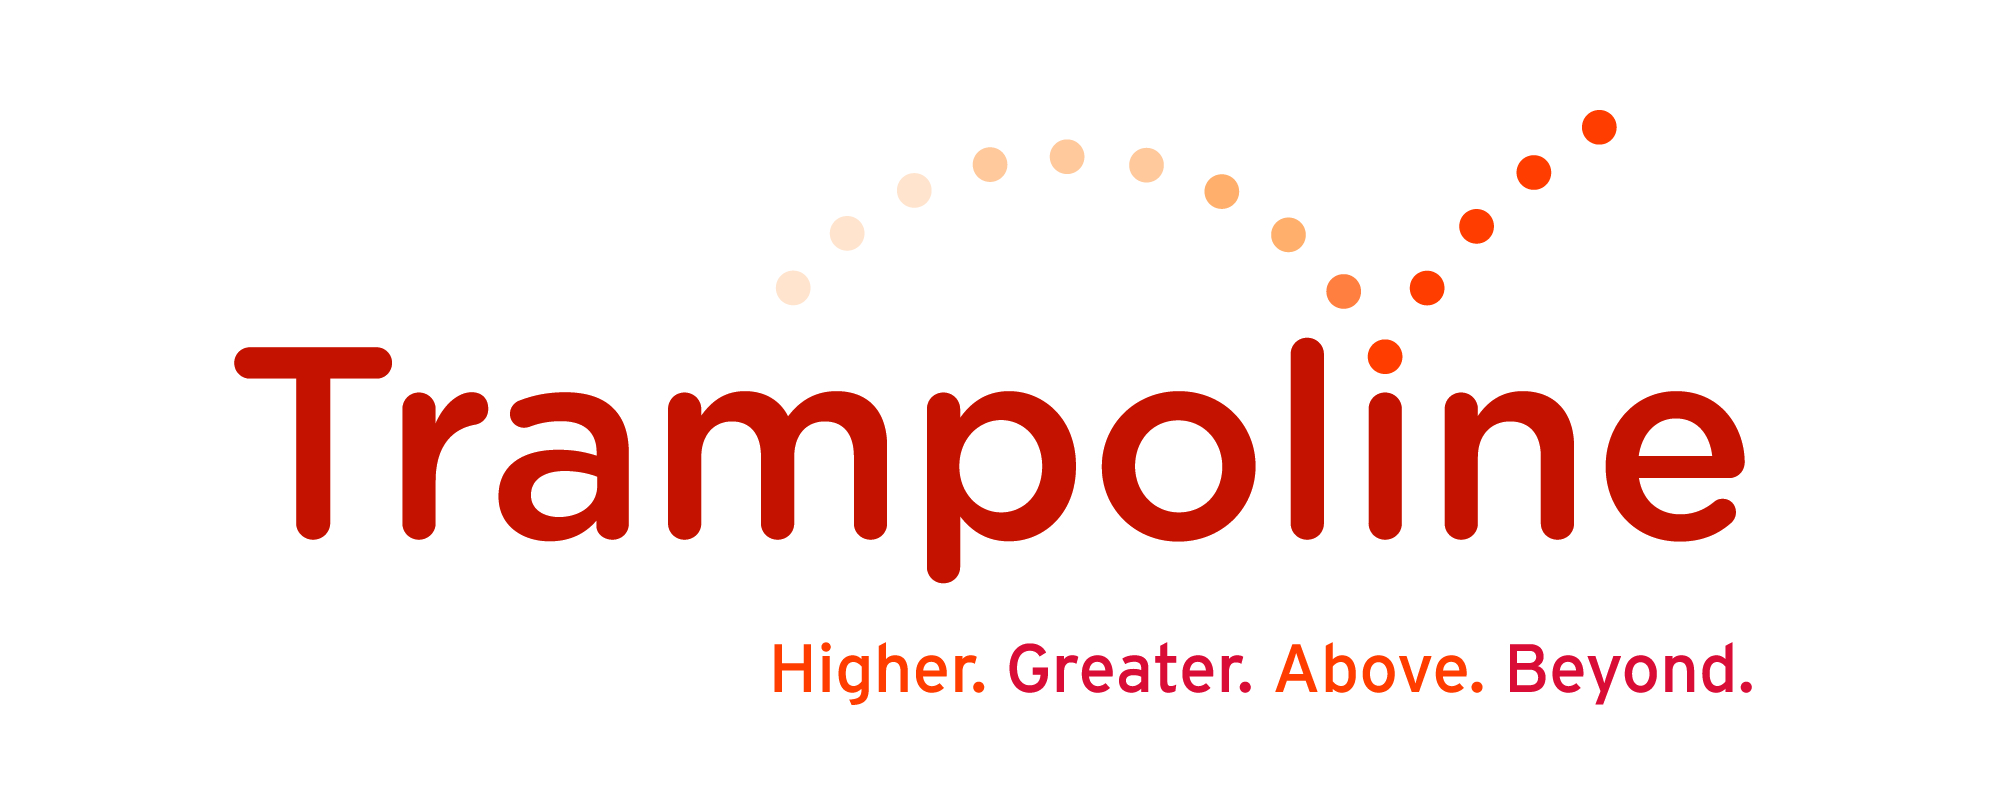 Trampoline Logo with Tagline Color.jpg